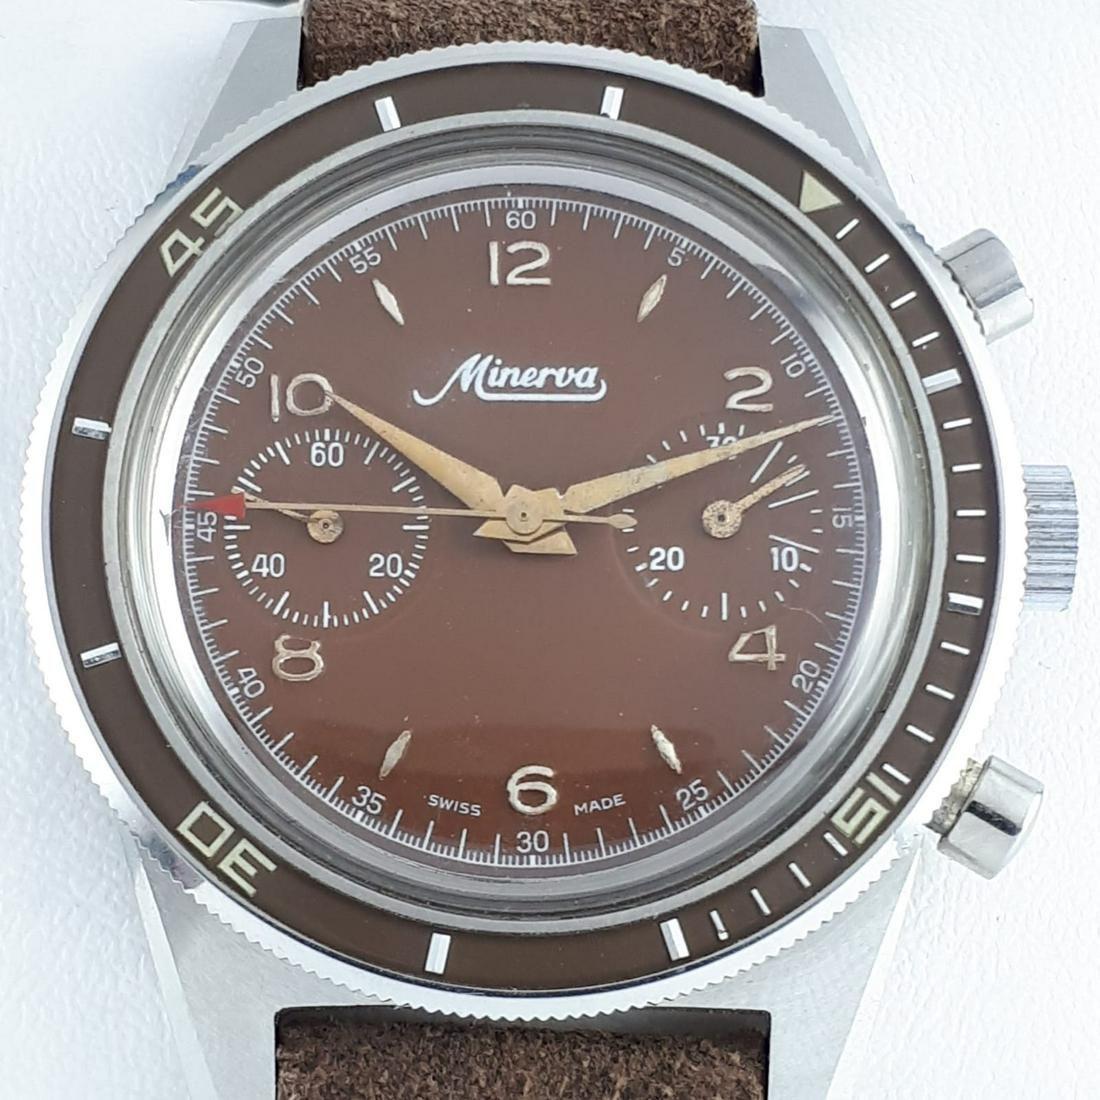 Minerva - Vintage Two Compax Diver Chronograph Manual